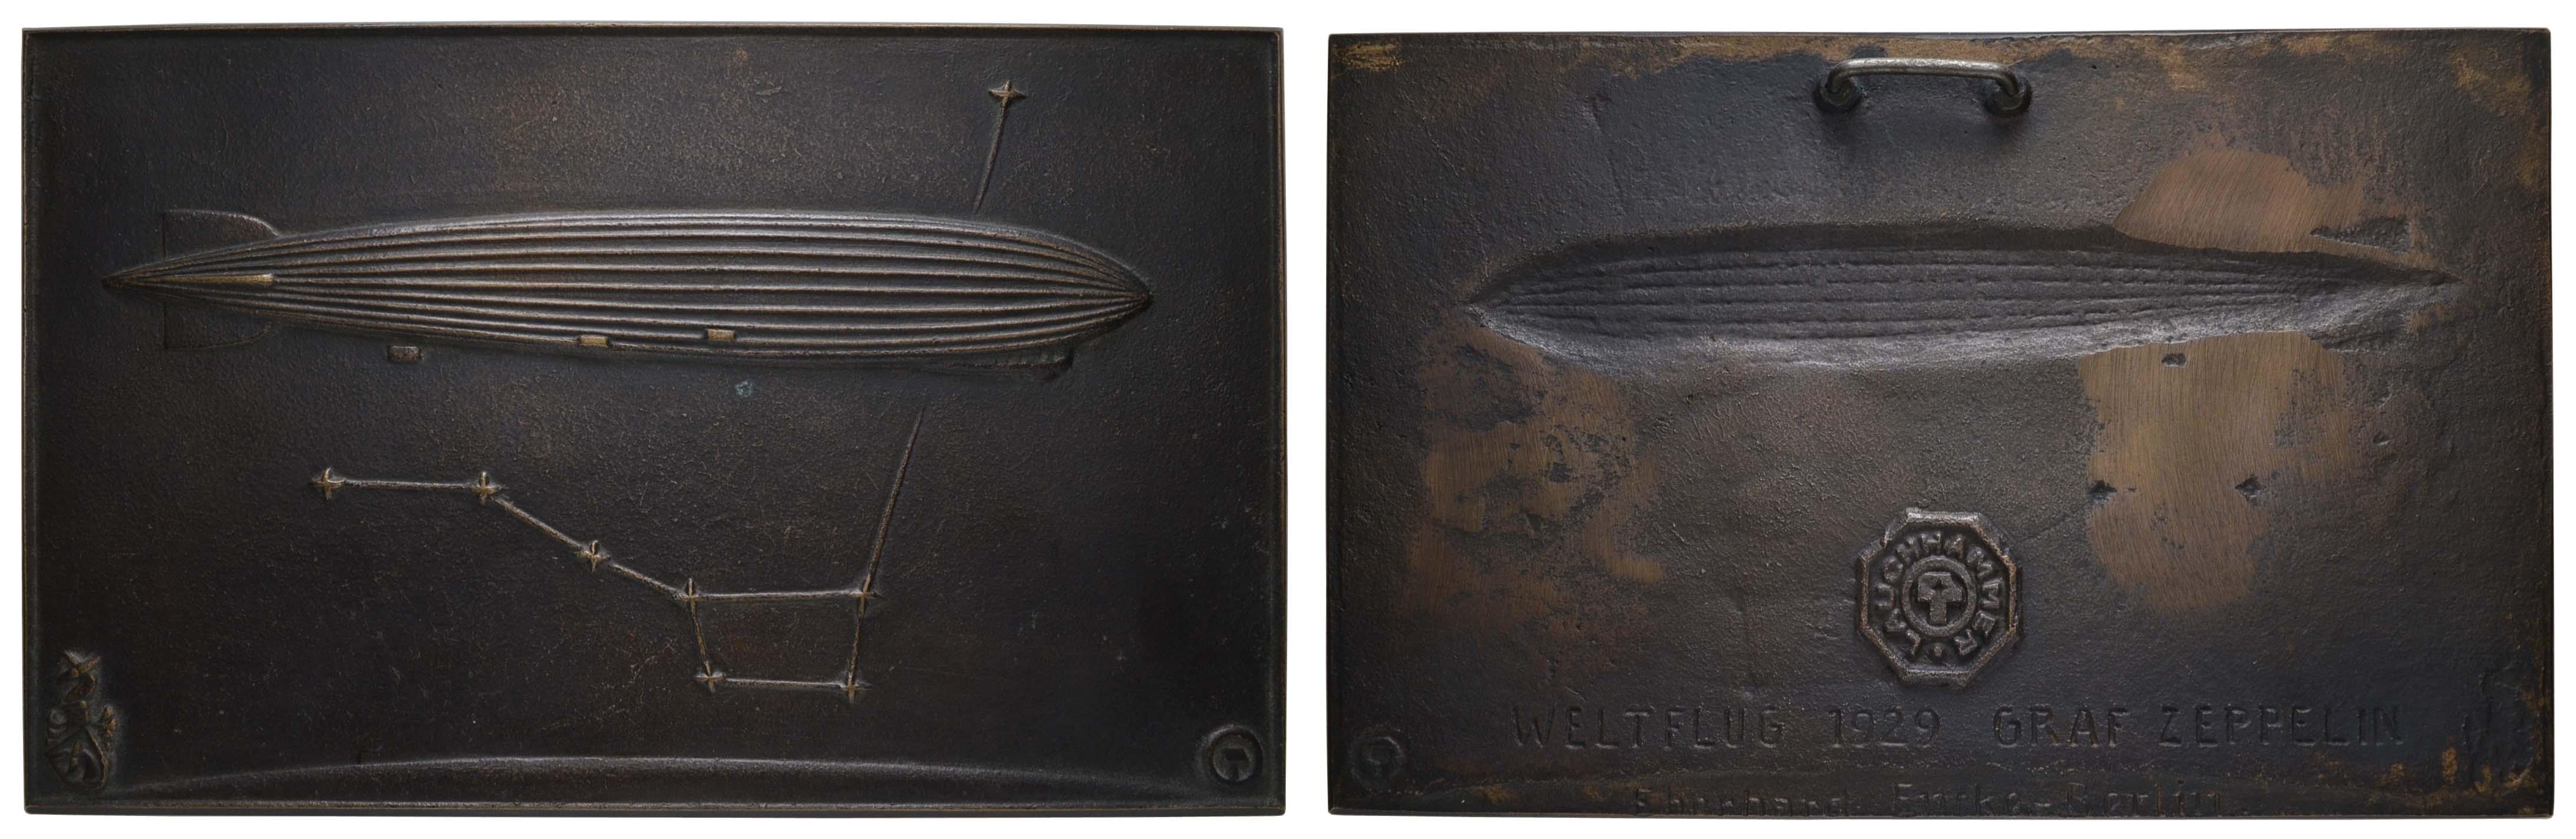 Lot 2339 - medaillen Sonstige Medaillen - Zeppelin -  Auktionshaus Ulrich Felzmann GmbH & Co. KG Coins single lots